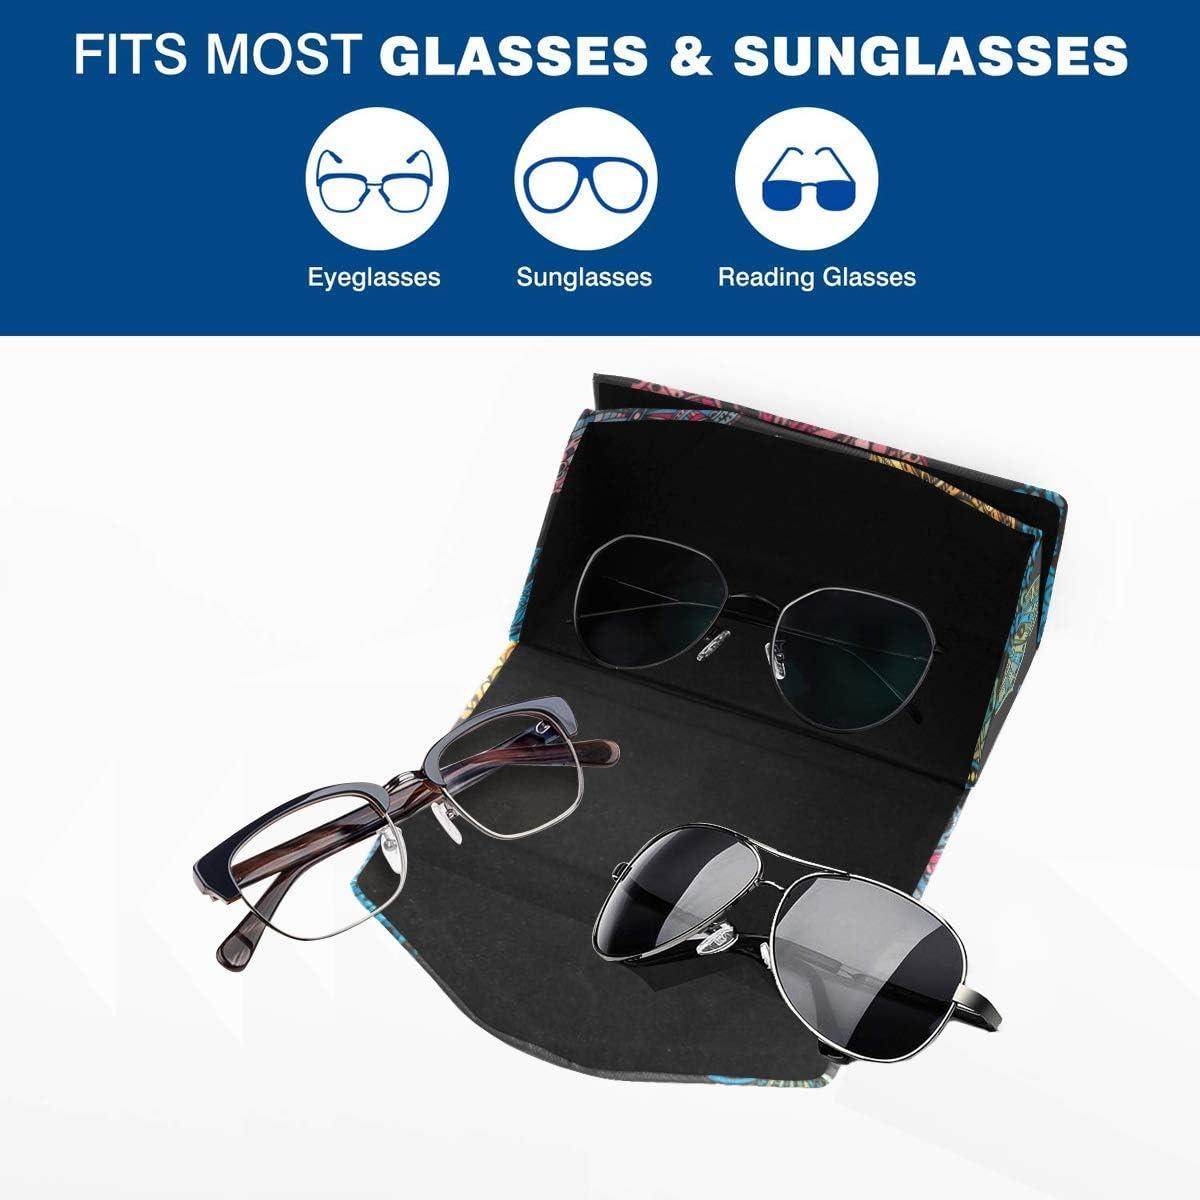 Glasses Case Ornate Doodle Butterflies Eyeglass Case Leather Magnetic Folding Hard Case Sunglasses Eyewear Protective Case